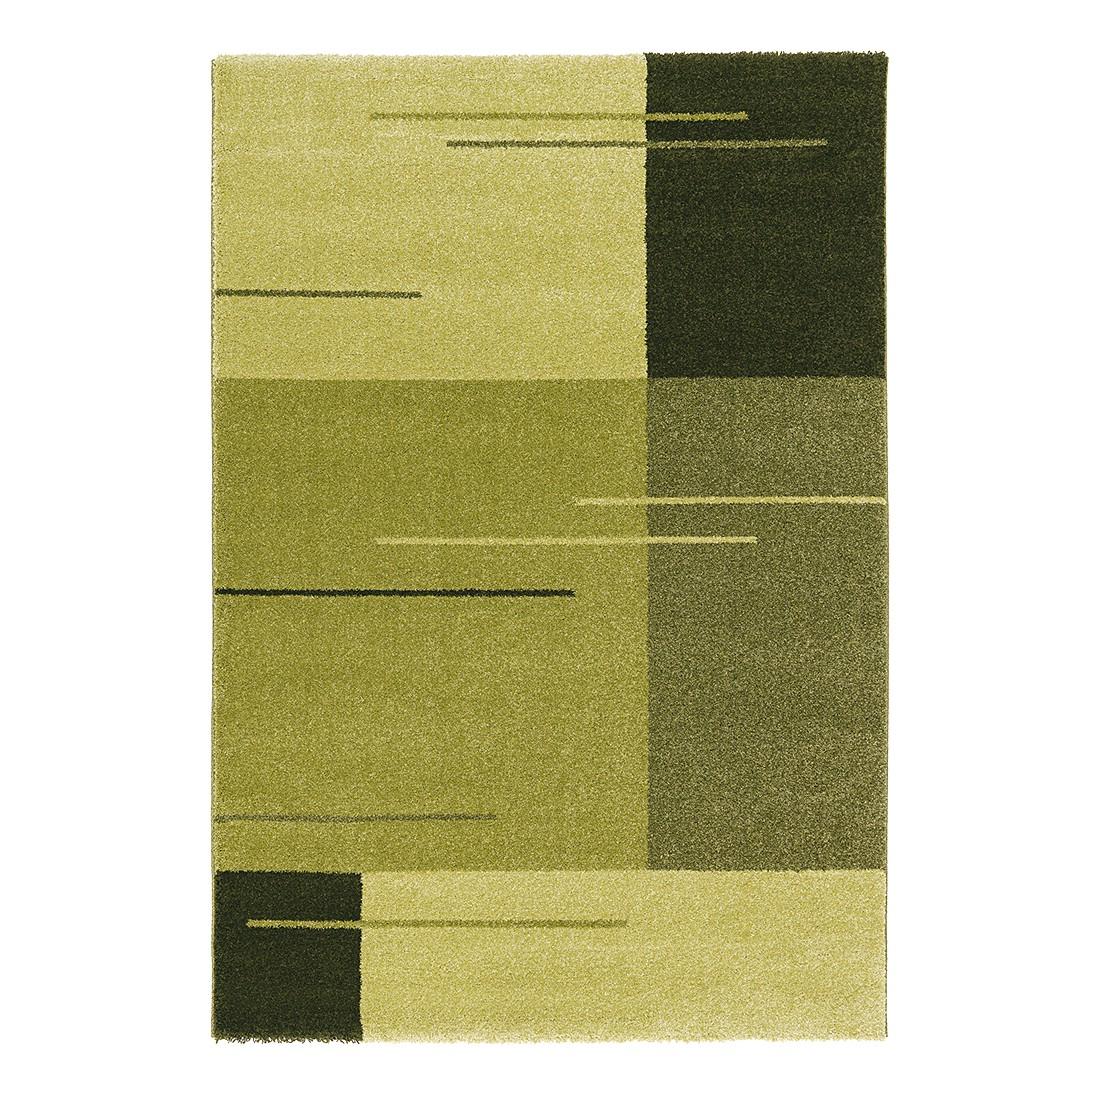 Teppich Samoa II - Hellgrün - 200 x 290 cm, Astra